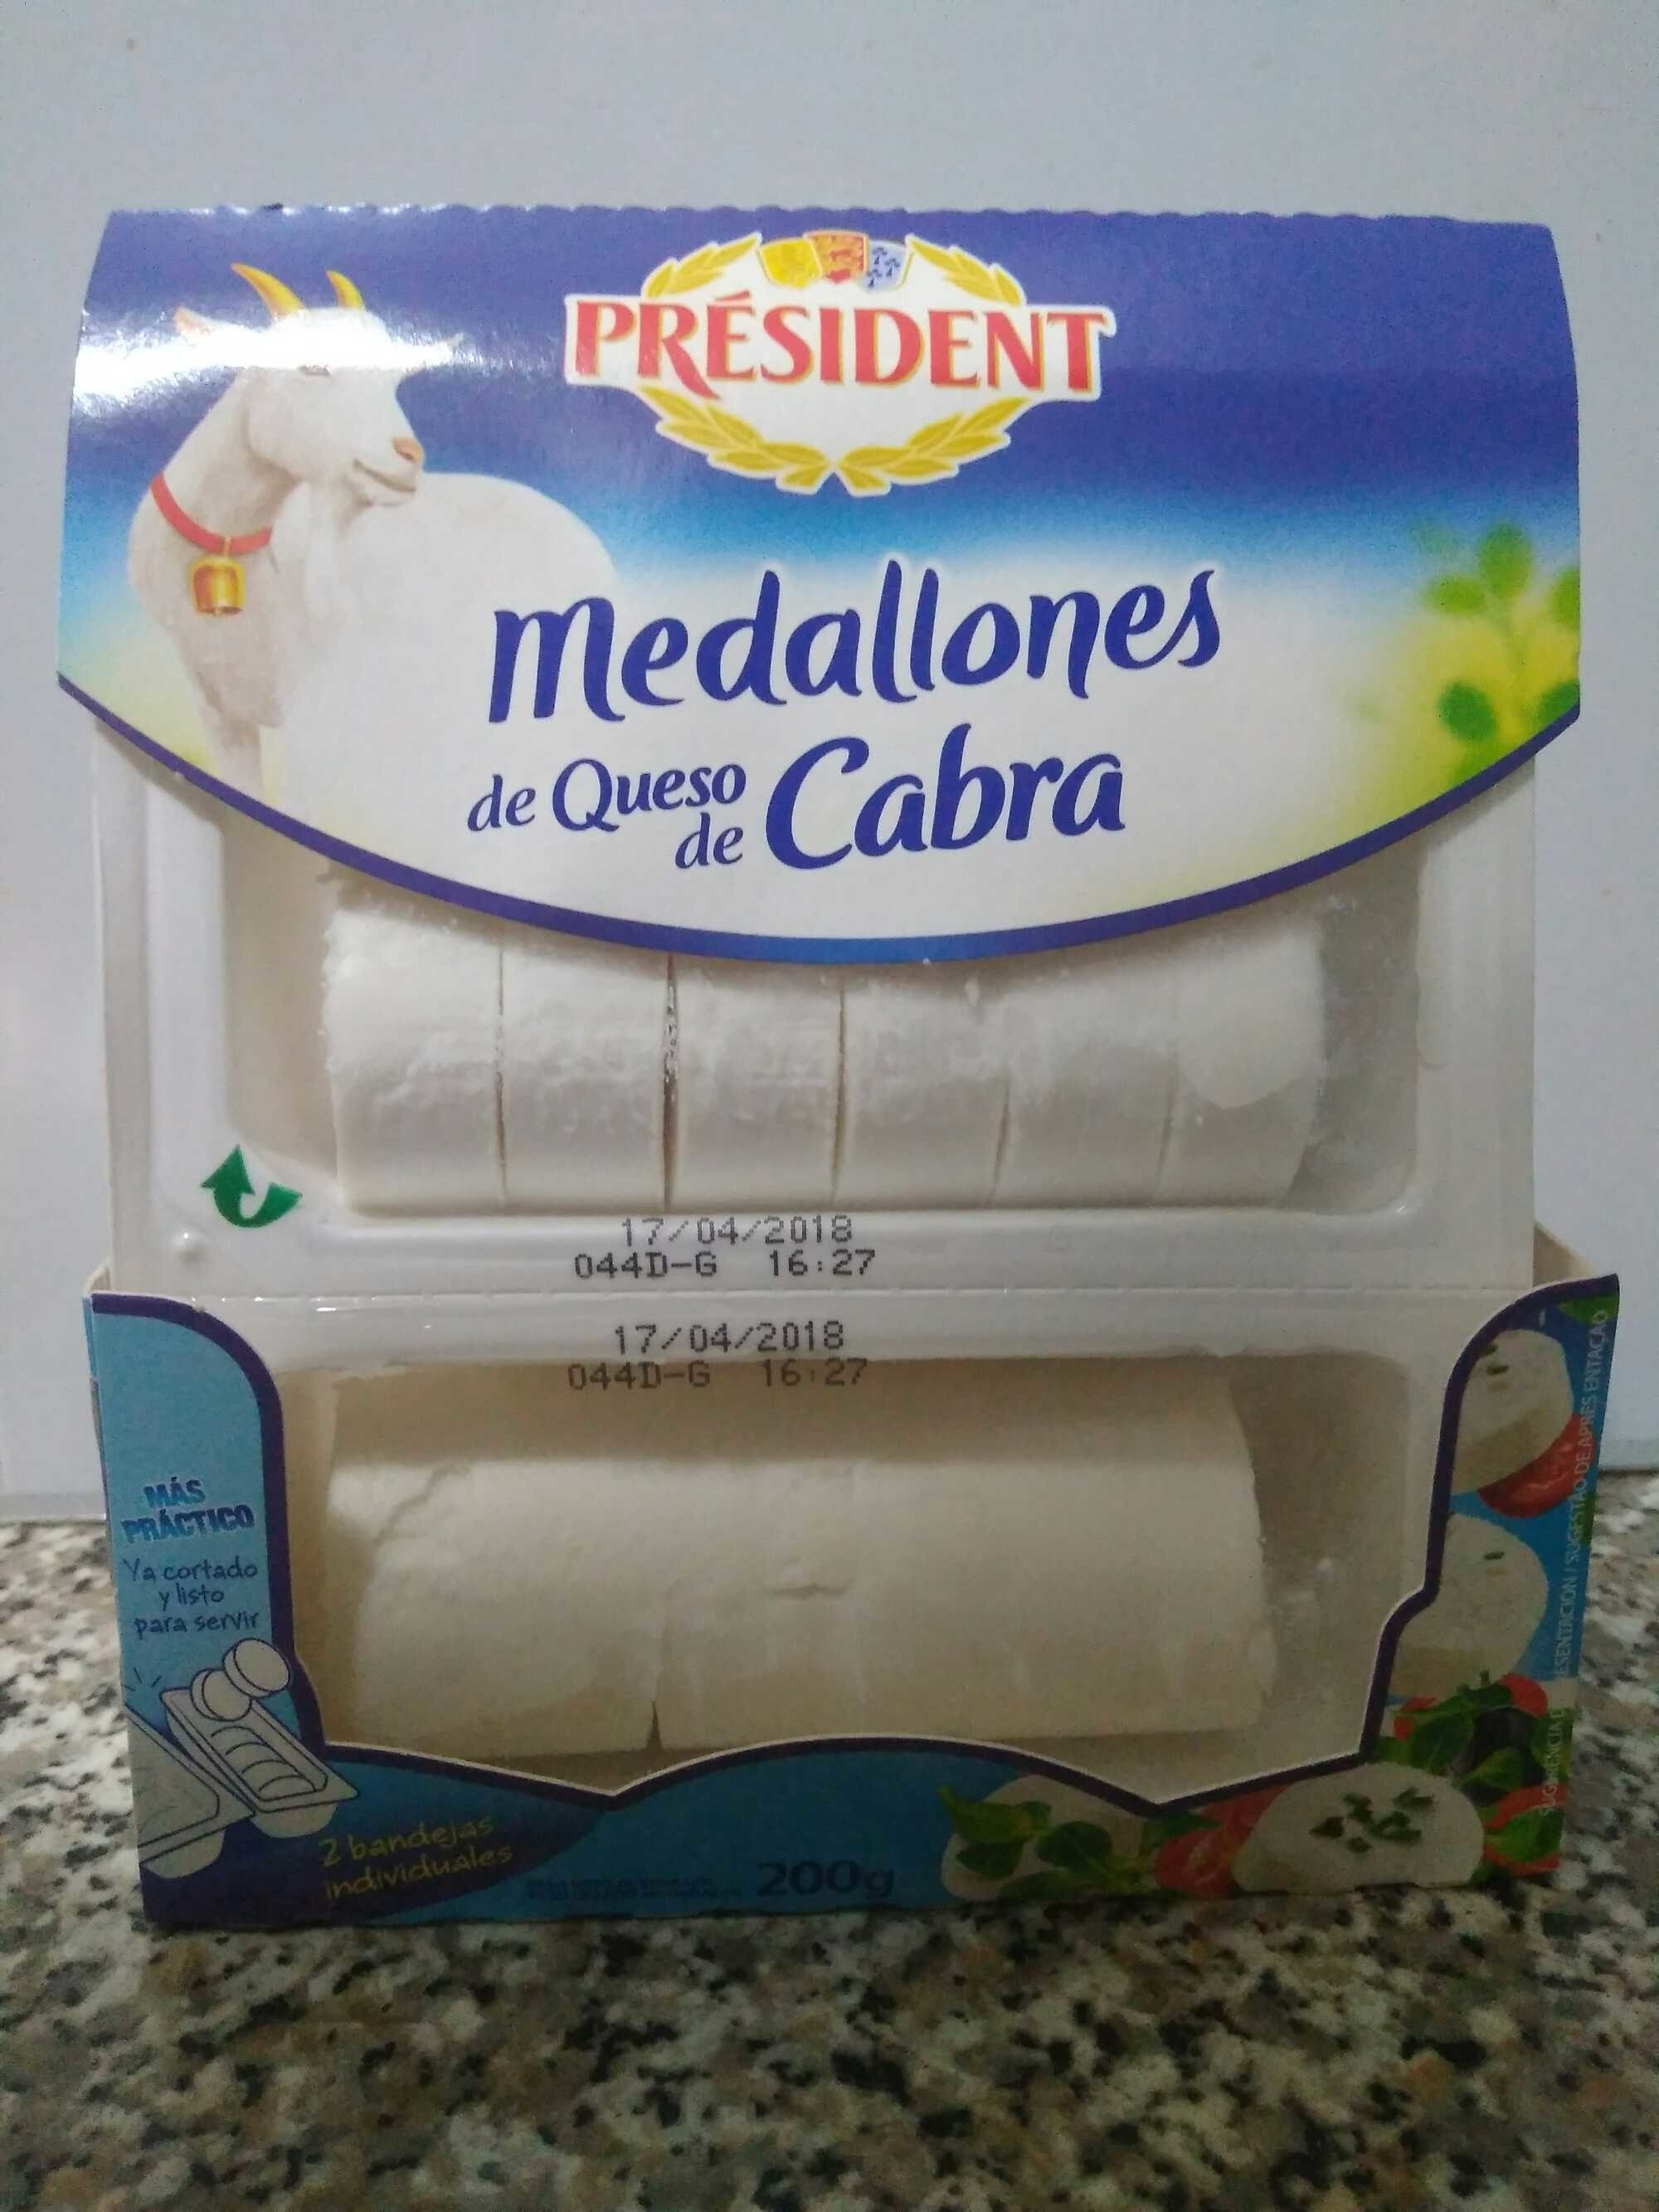 Queso fresco de cabra medallones - Product